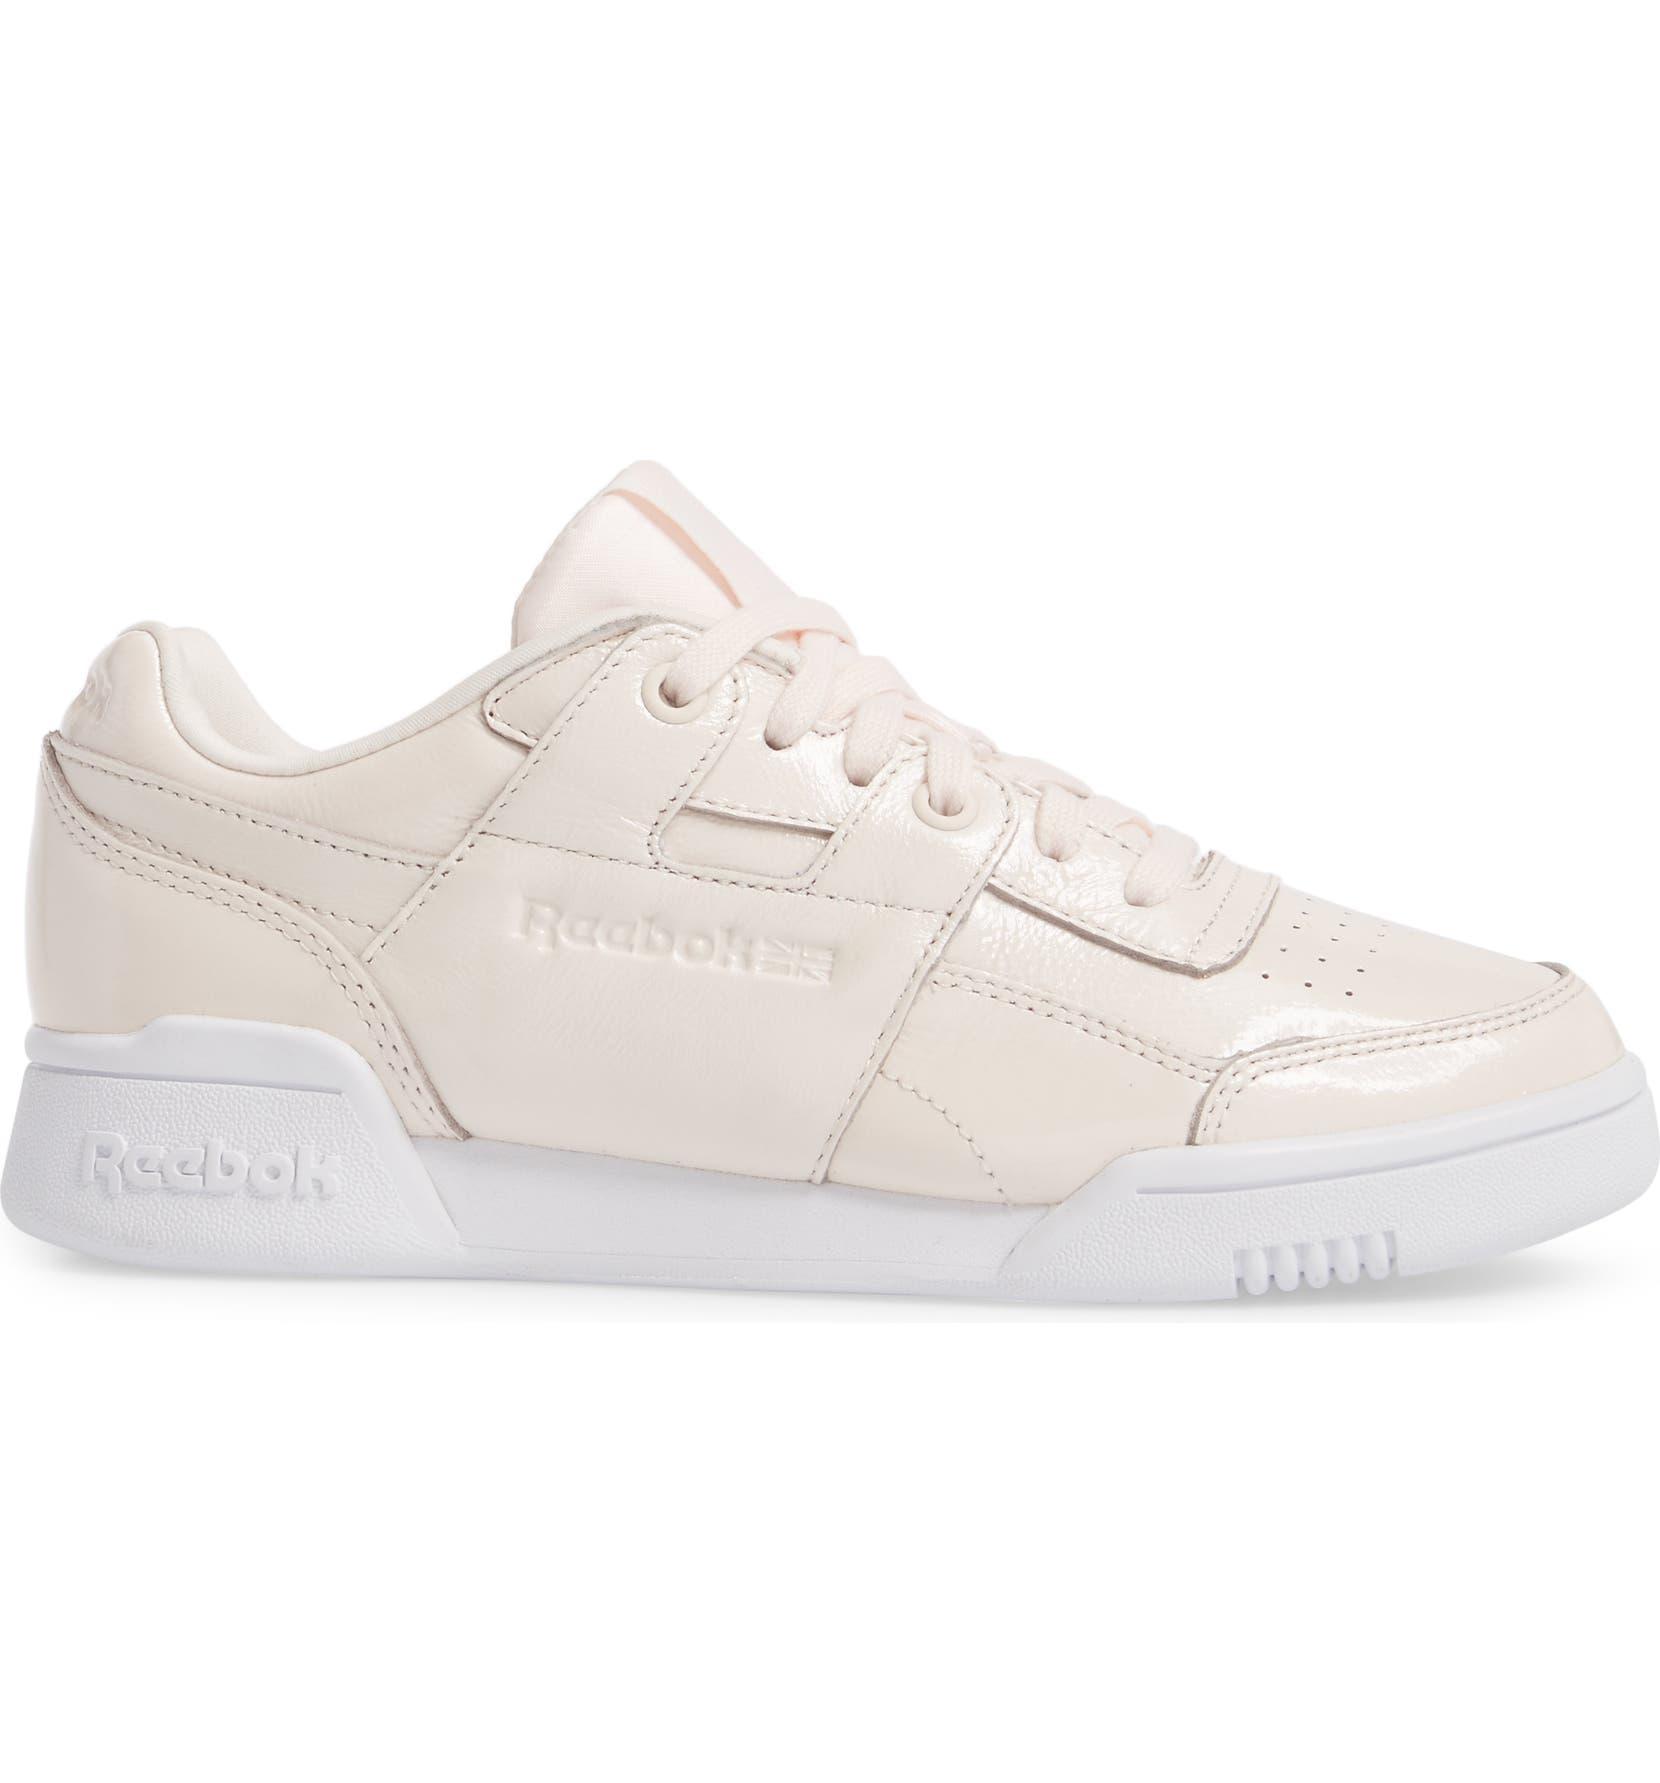 Reebok Workout Lo Plus Iridescent Sneaker (Women)  2c7986af0